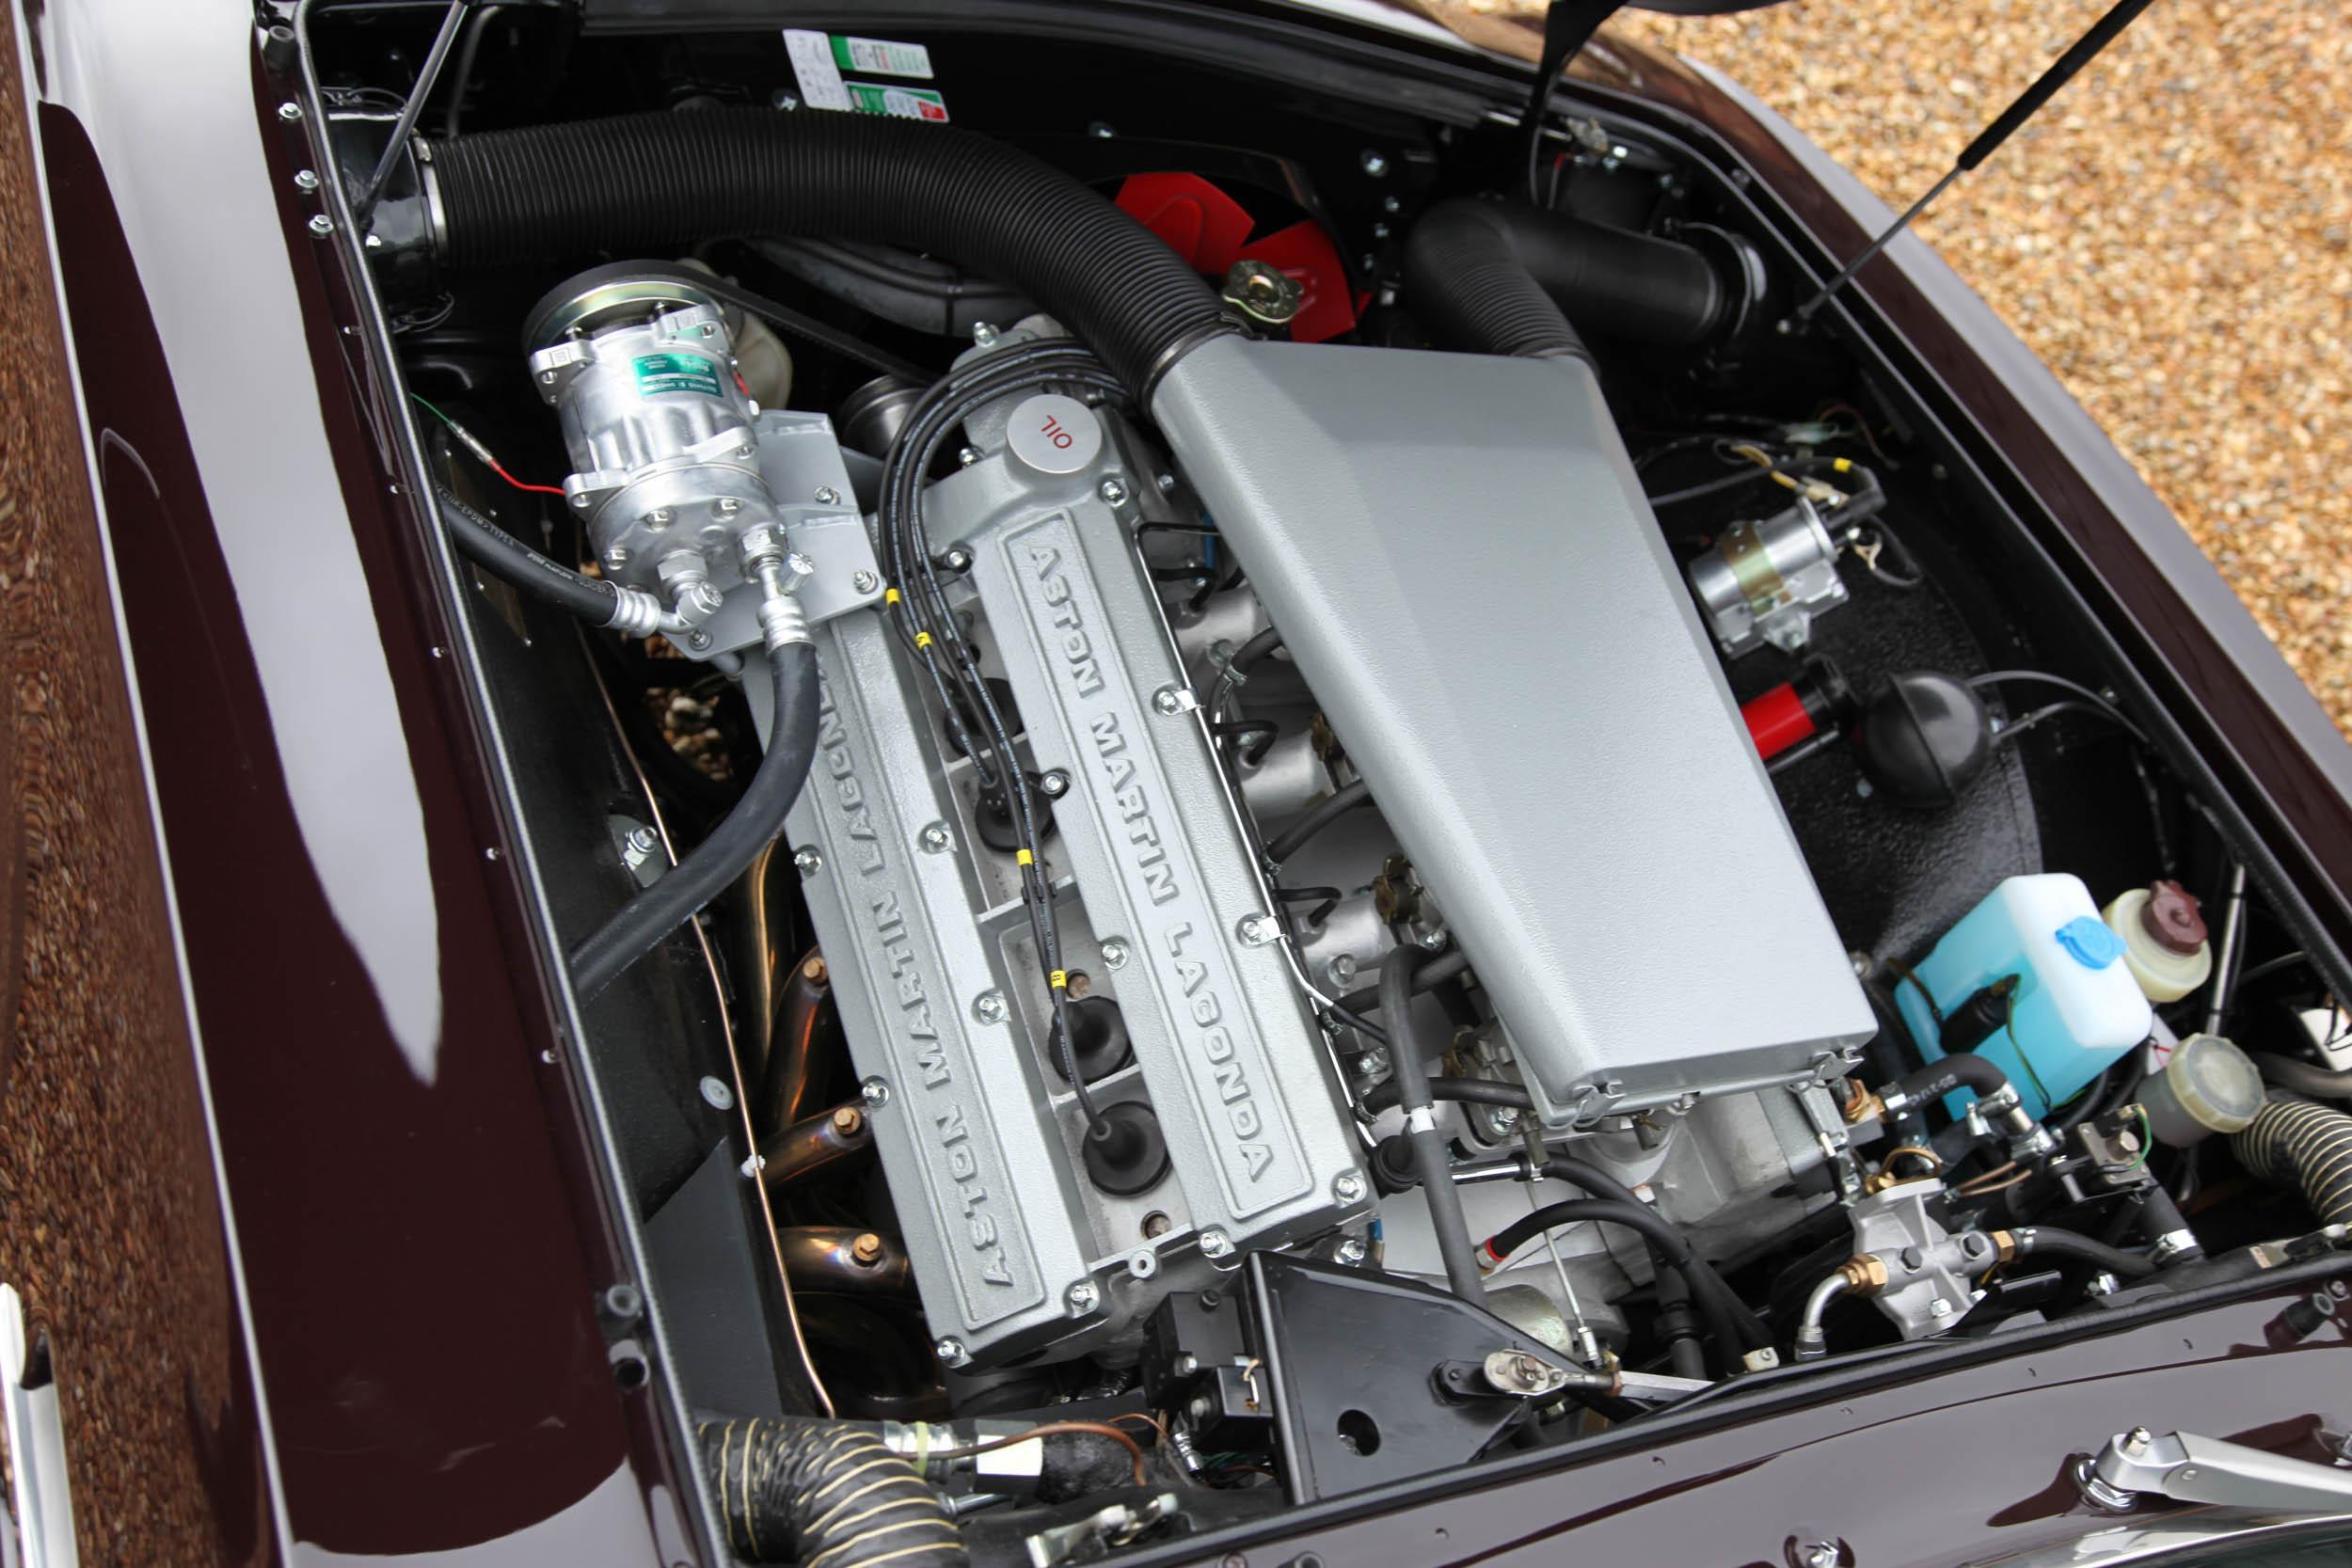 1985 Aston Martin V8 Vantage 7 Litre